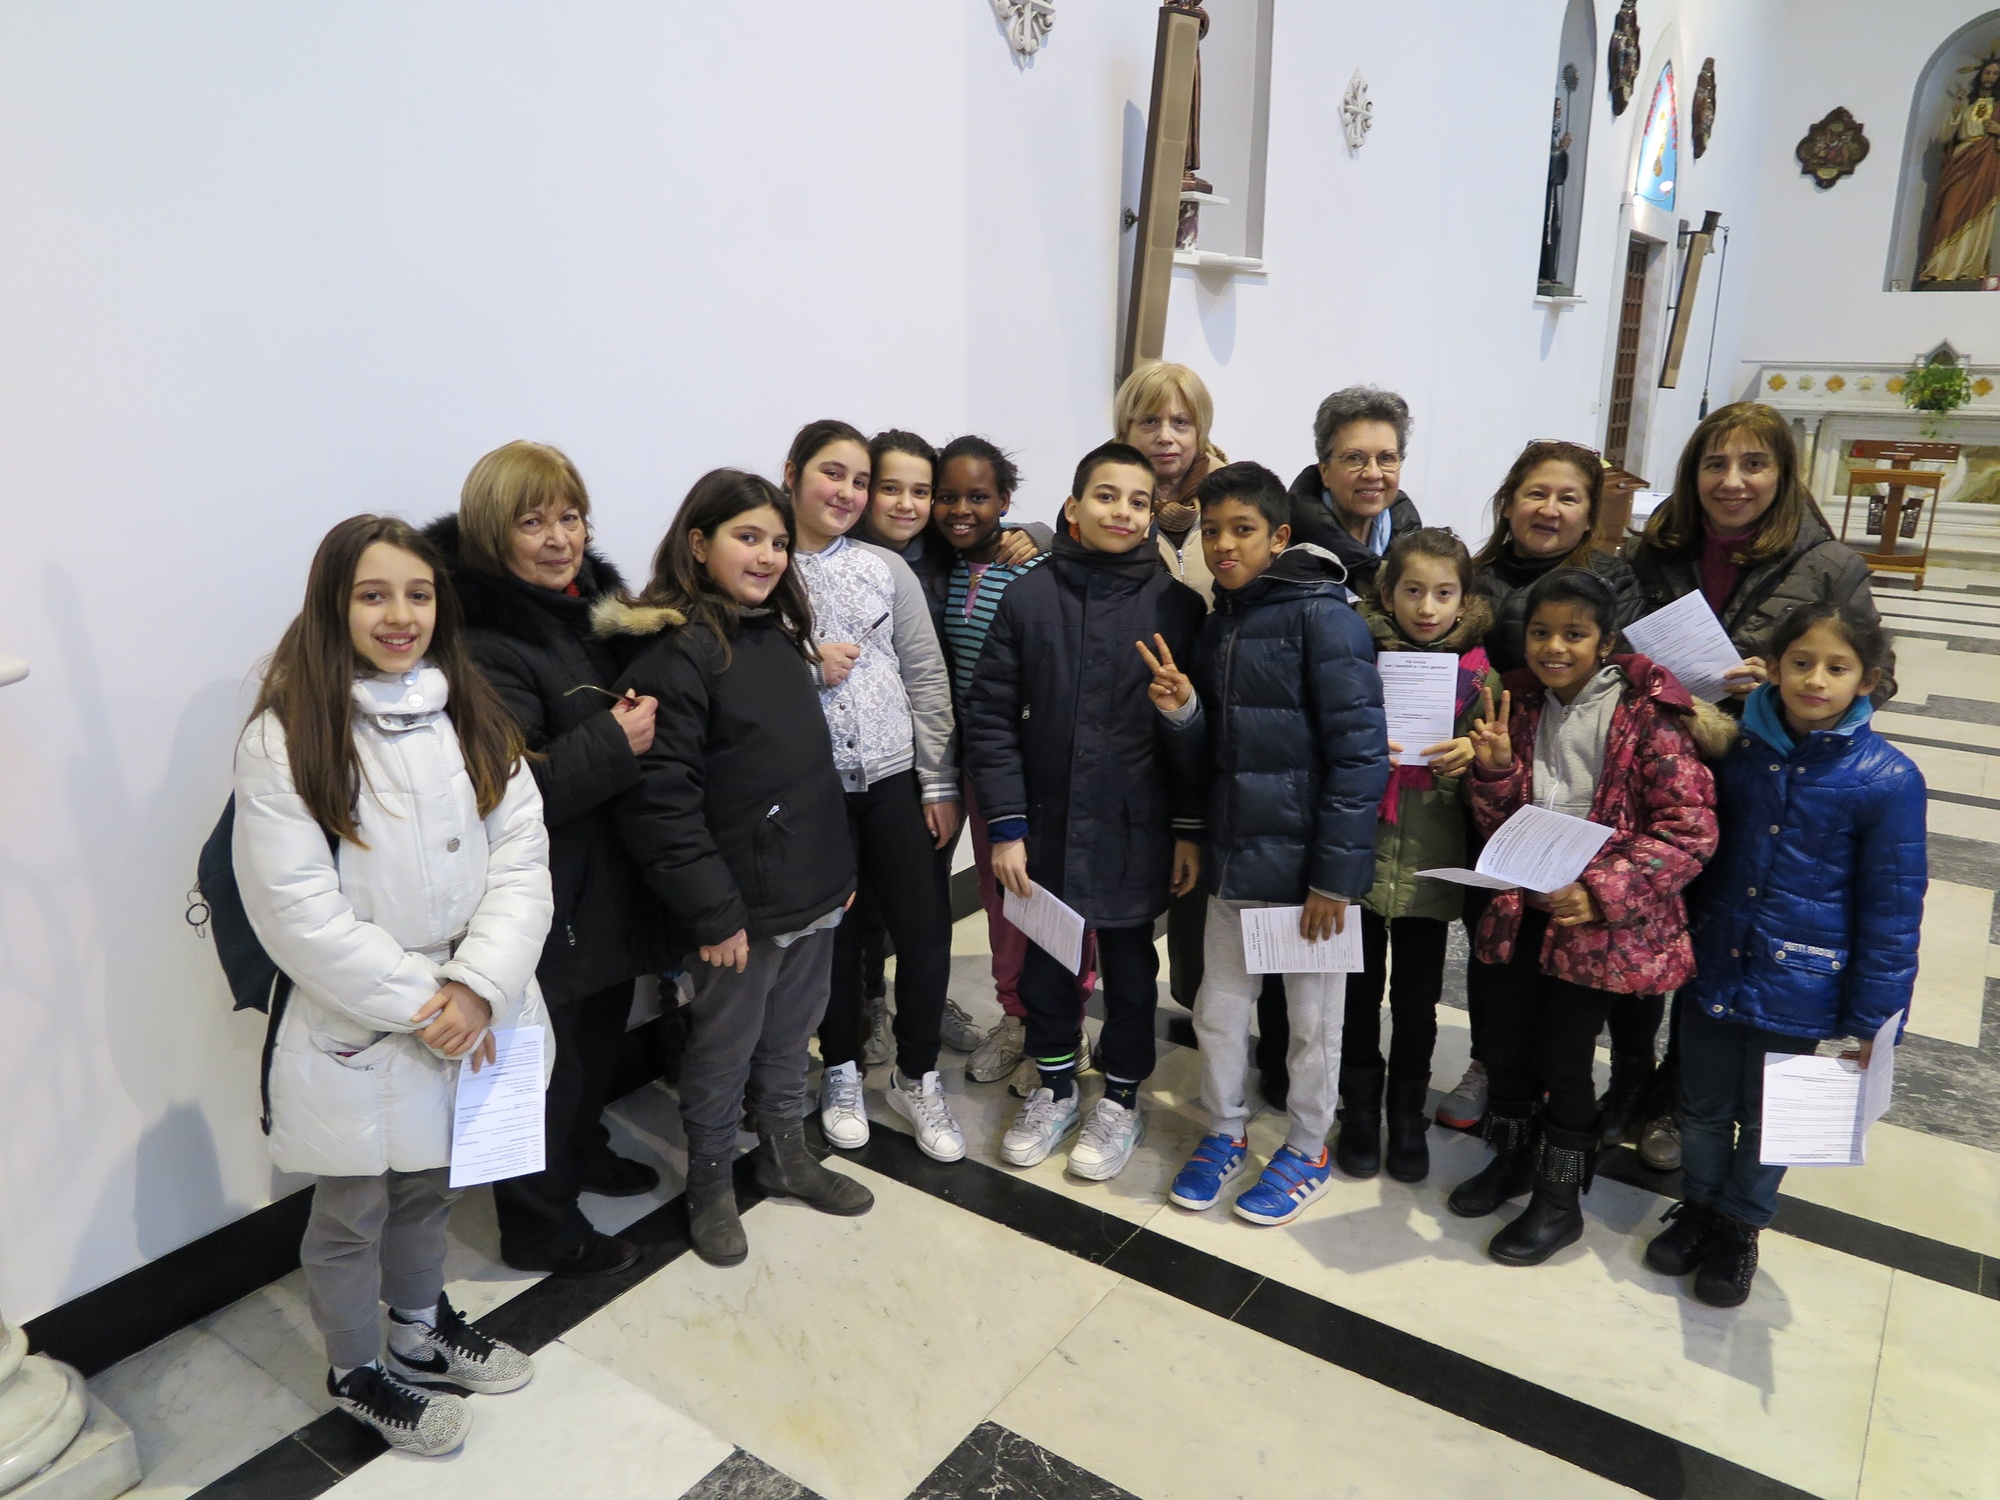 via-crucis-catechismo-2016-03-17-16-49-31